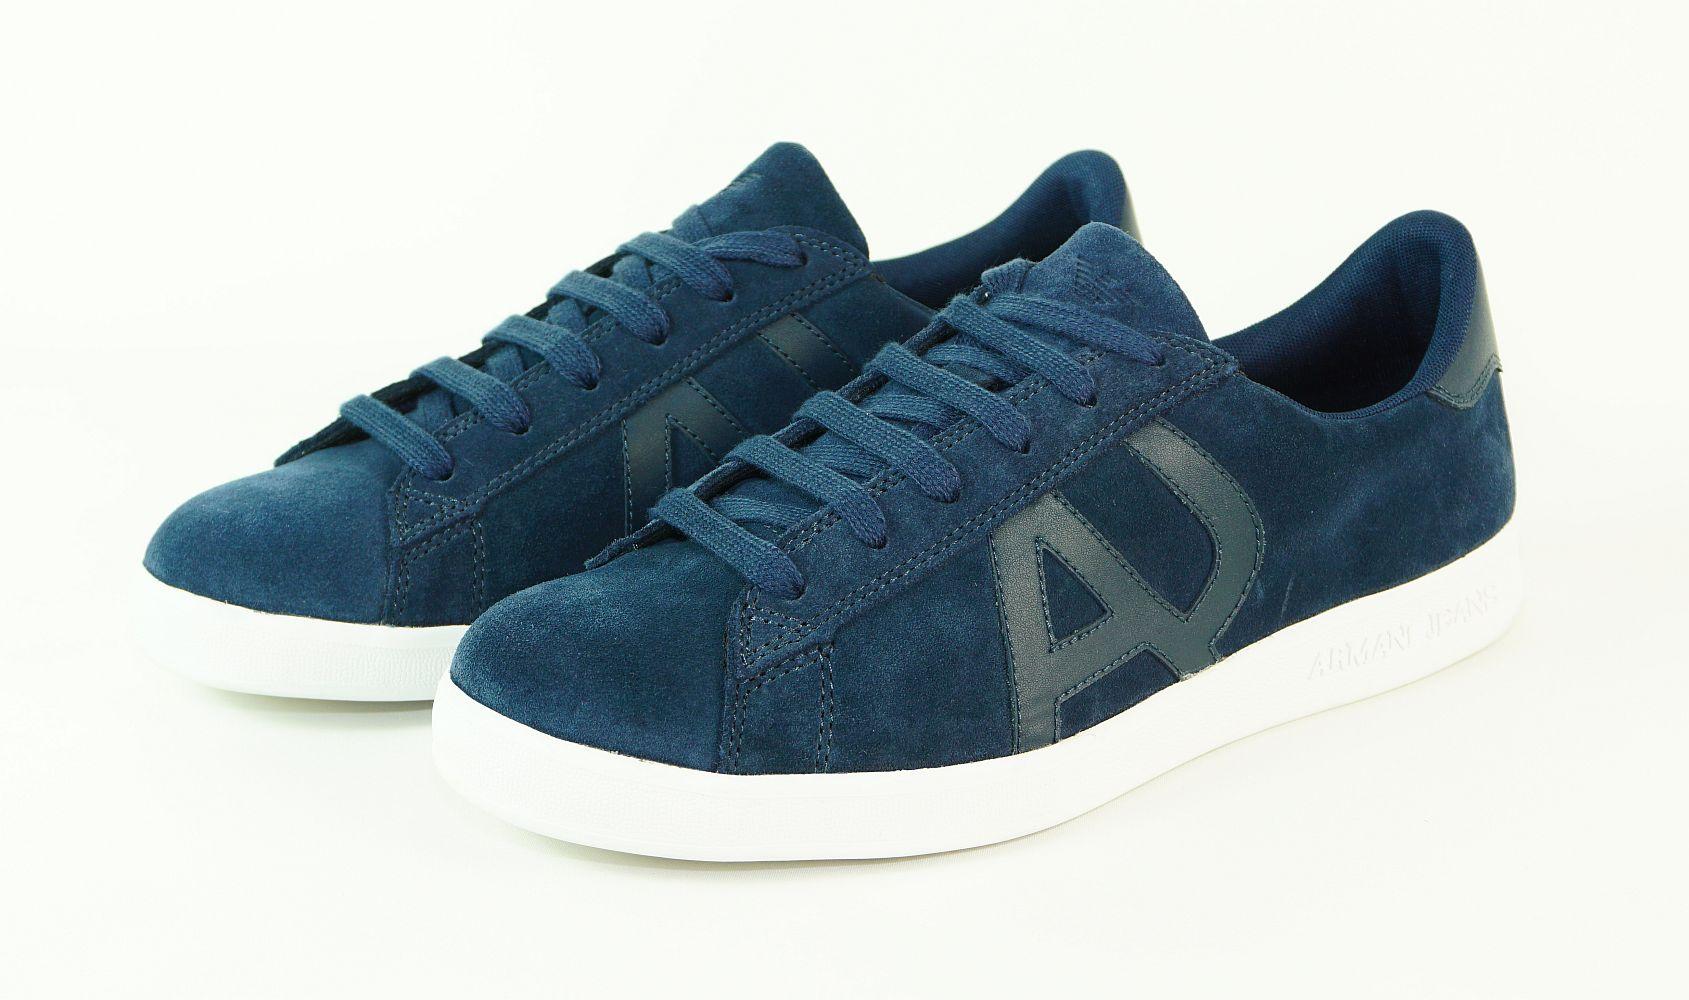 Armani Jeans Schuhe Sneaker Low Cut 935565 CC501 32335 Blue Peacoat HW16-AJ